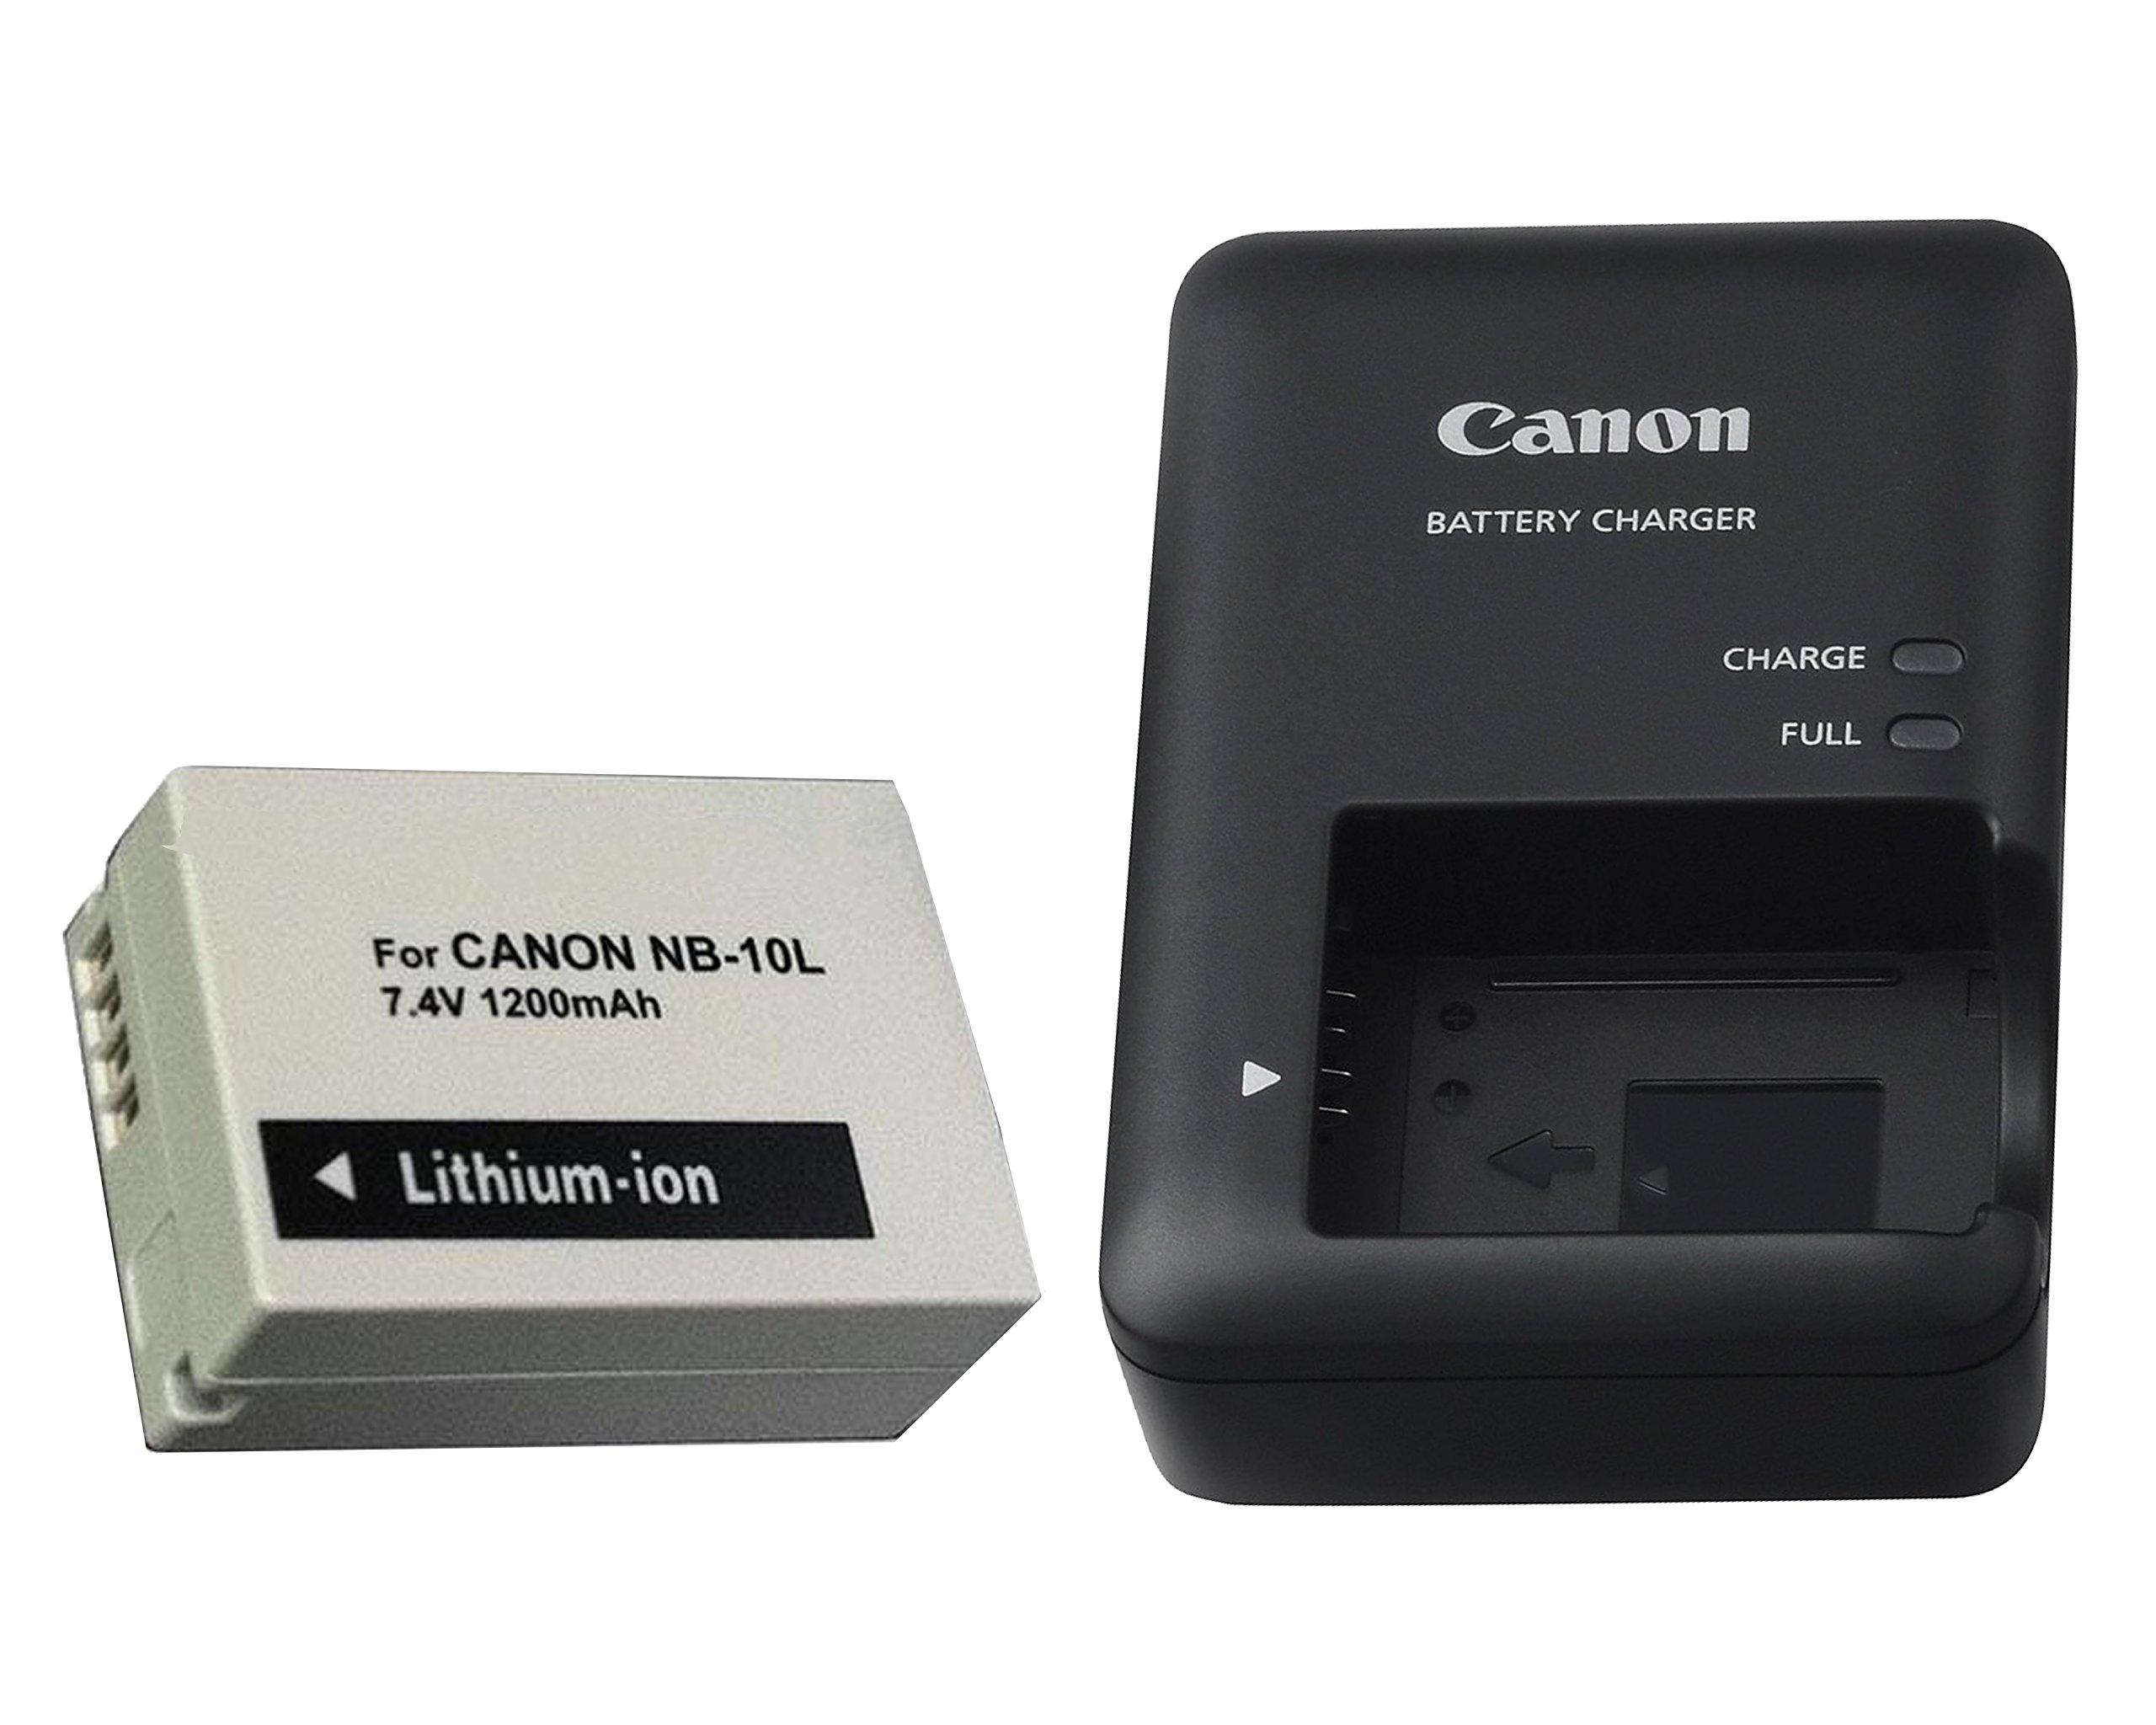 Excelshots, CB-2LC Battery Charger + Proffessional NB-10L Li-ion Battery Pack, for Canon PowerShot SX40 HS, SX50 HS, SX60 HS, G1X, G3X, G15, G16, Digital Camera.